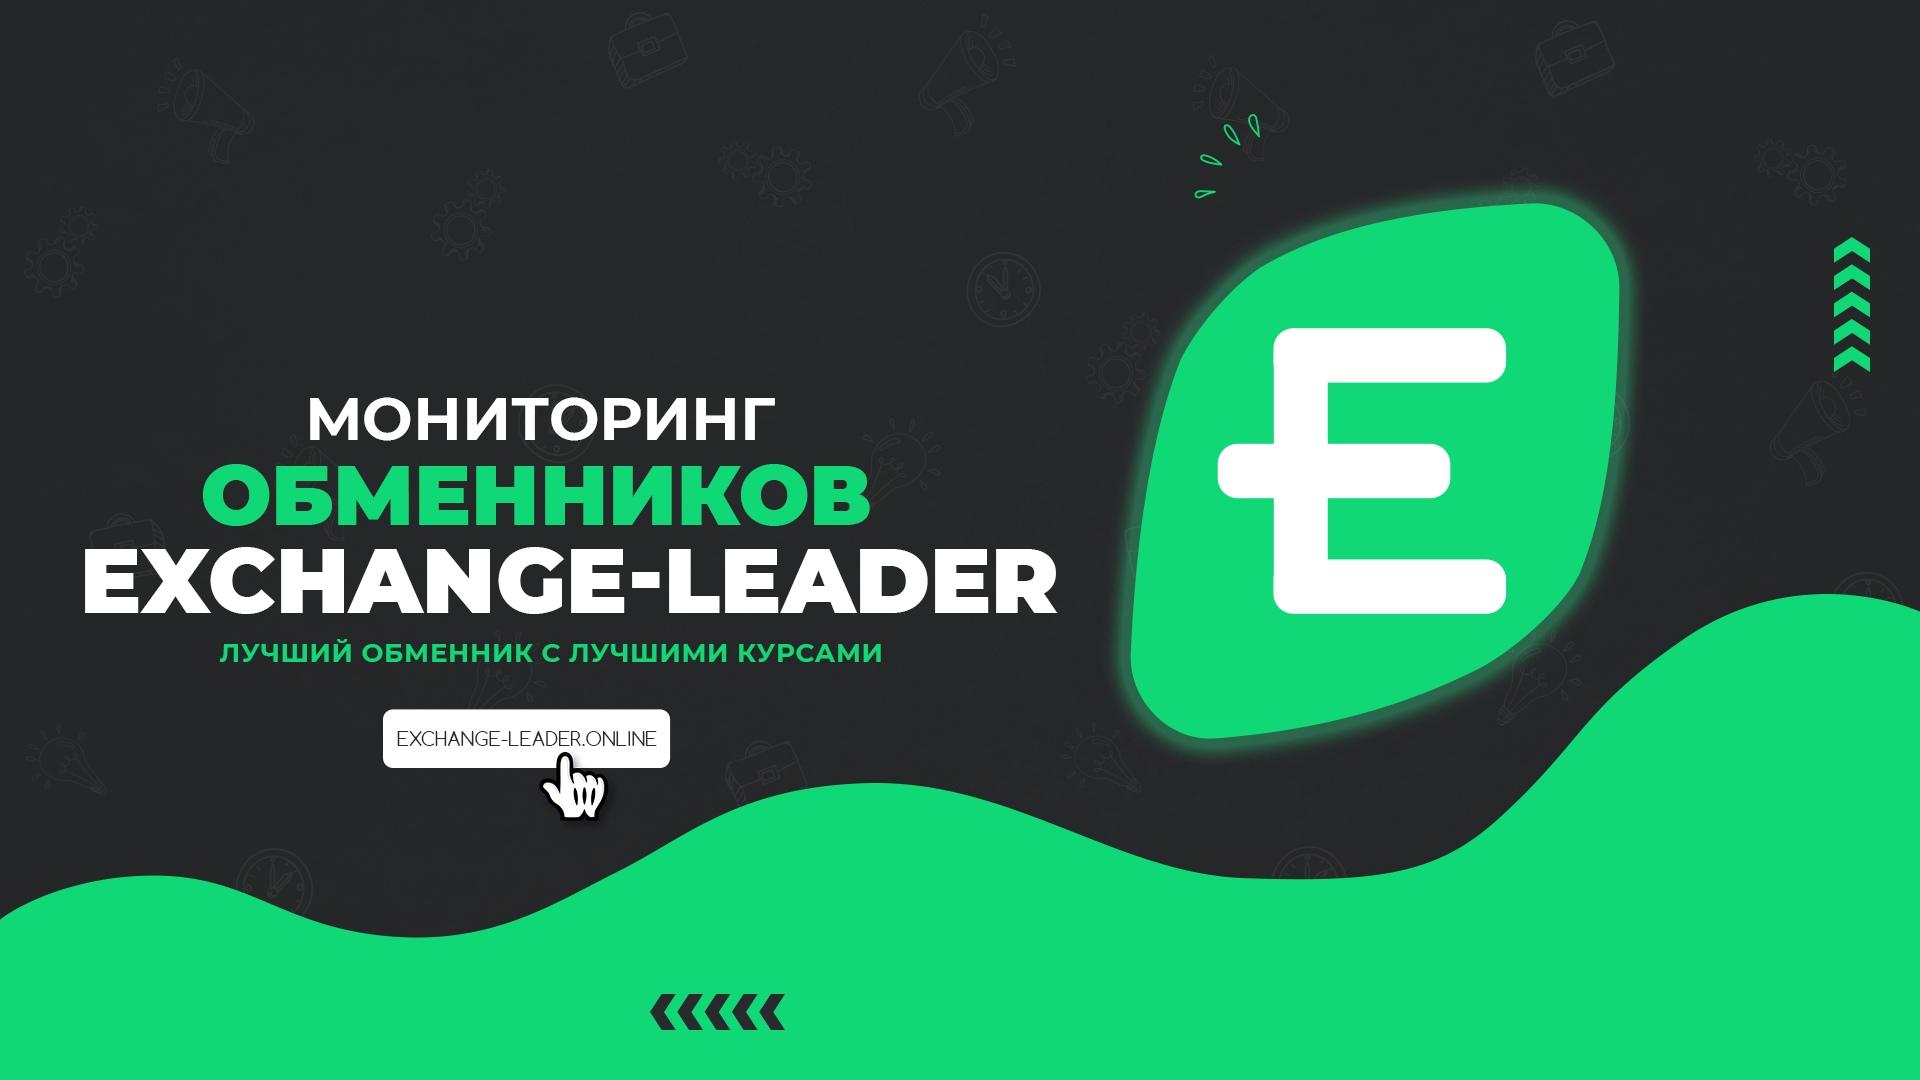 Как ОБМЕНЯТЬ валюту ОНЛАЙН 2021 году? Обмен электронных валют - Обзор Exchange-Leader.online